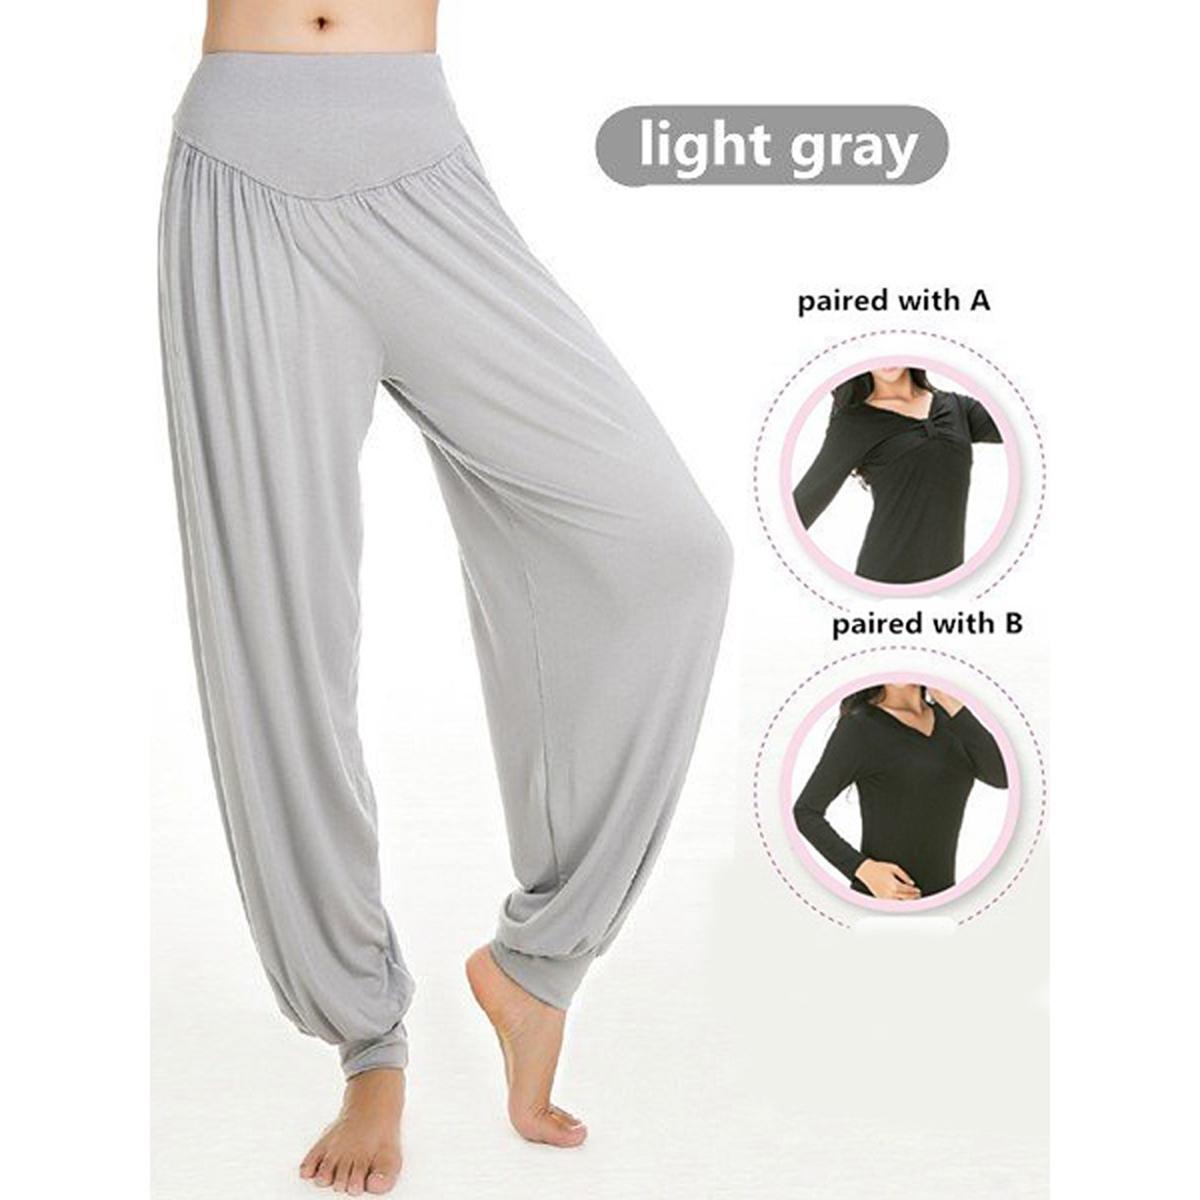 c2450e8e373 Women Professional Fitness Dancing Yoga Pants Jogging Running Sport Long  Trousers Loose Modal Cotton Sport Trousers